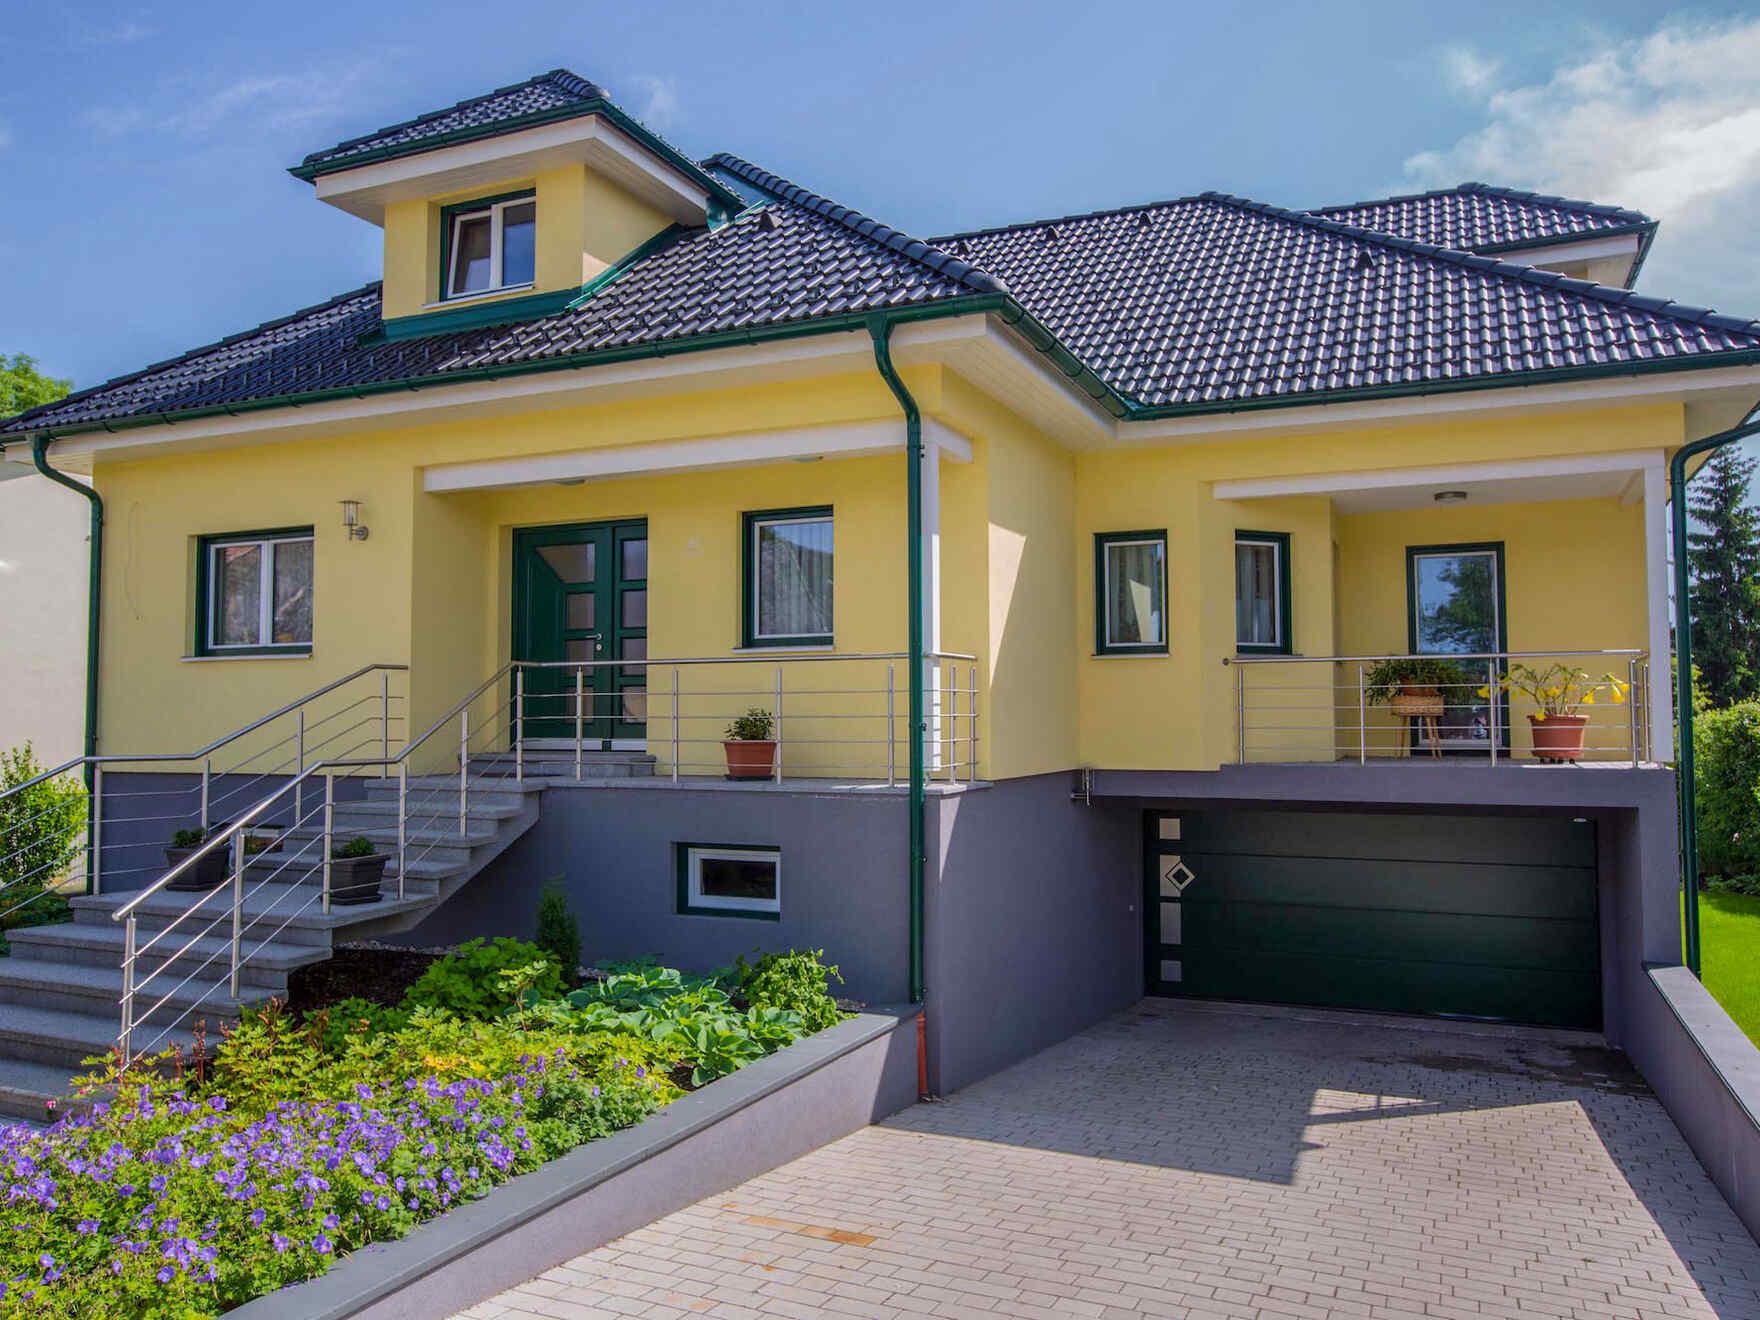 Prefabricated house Familie Hugl